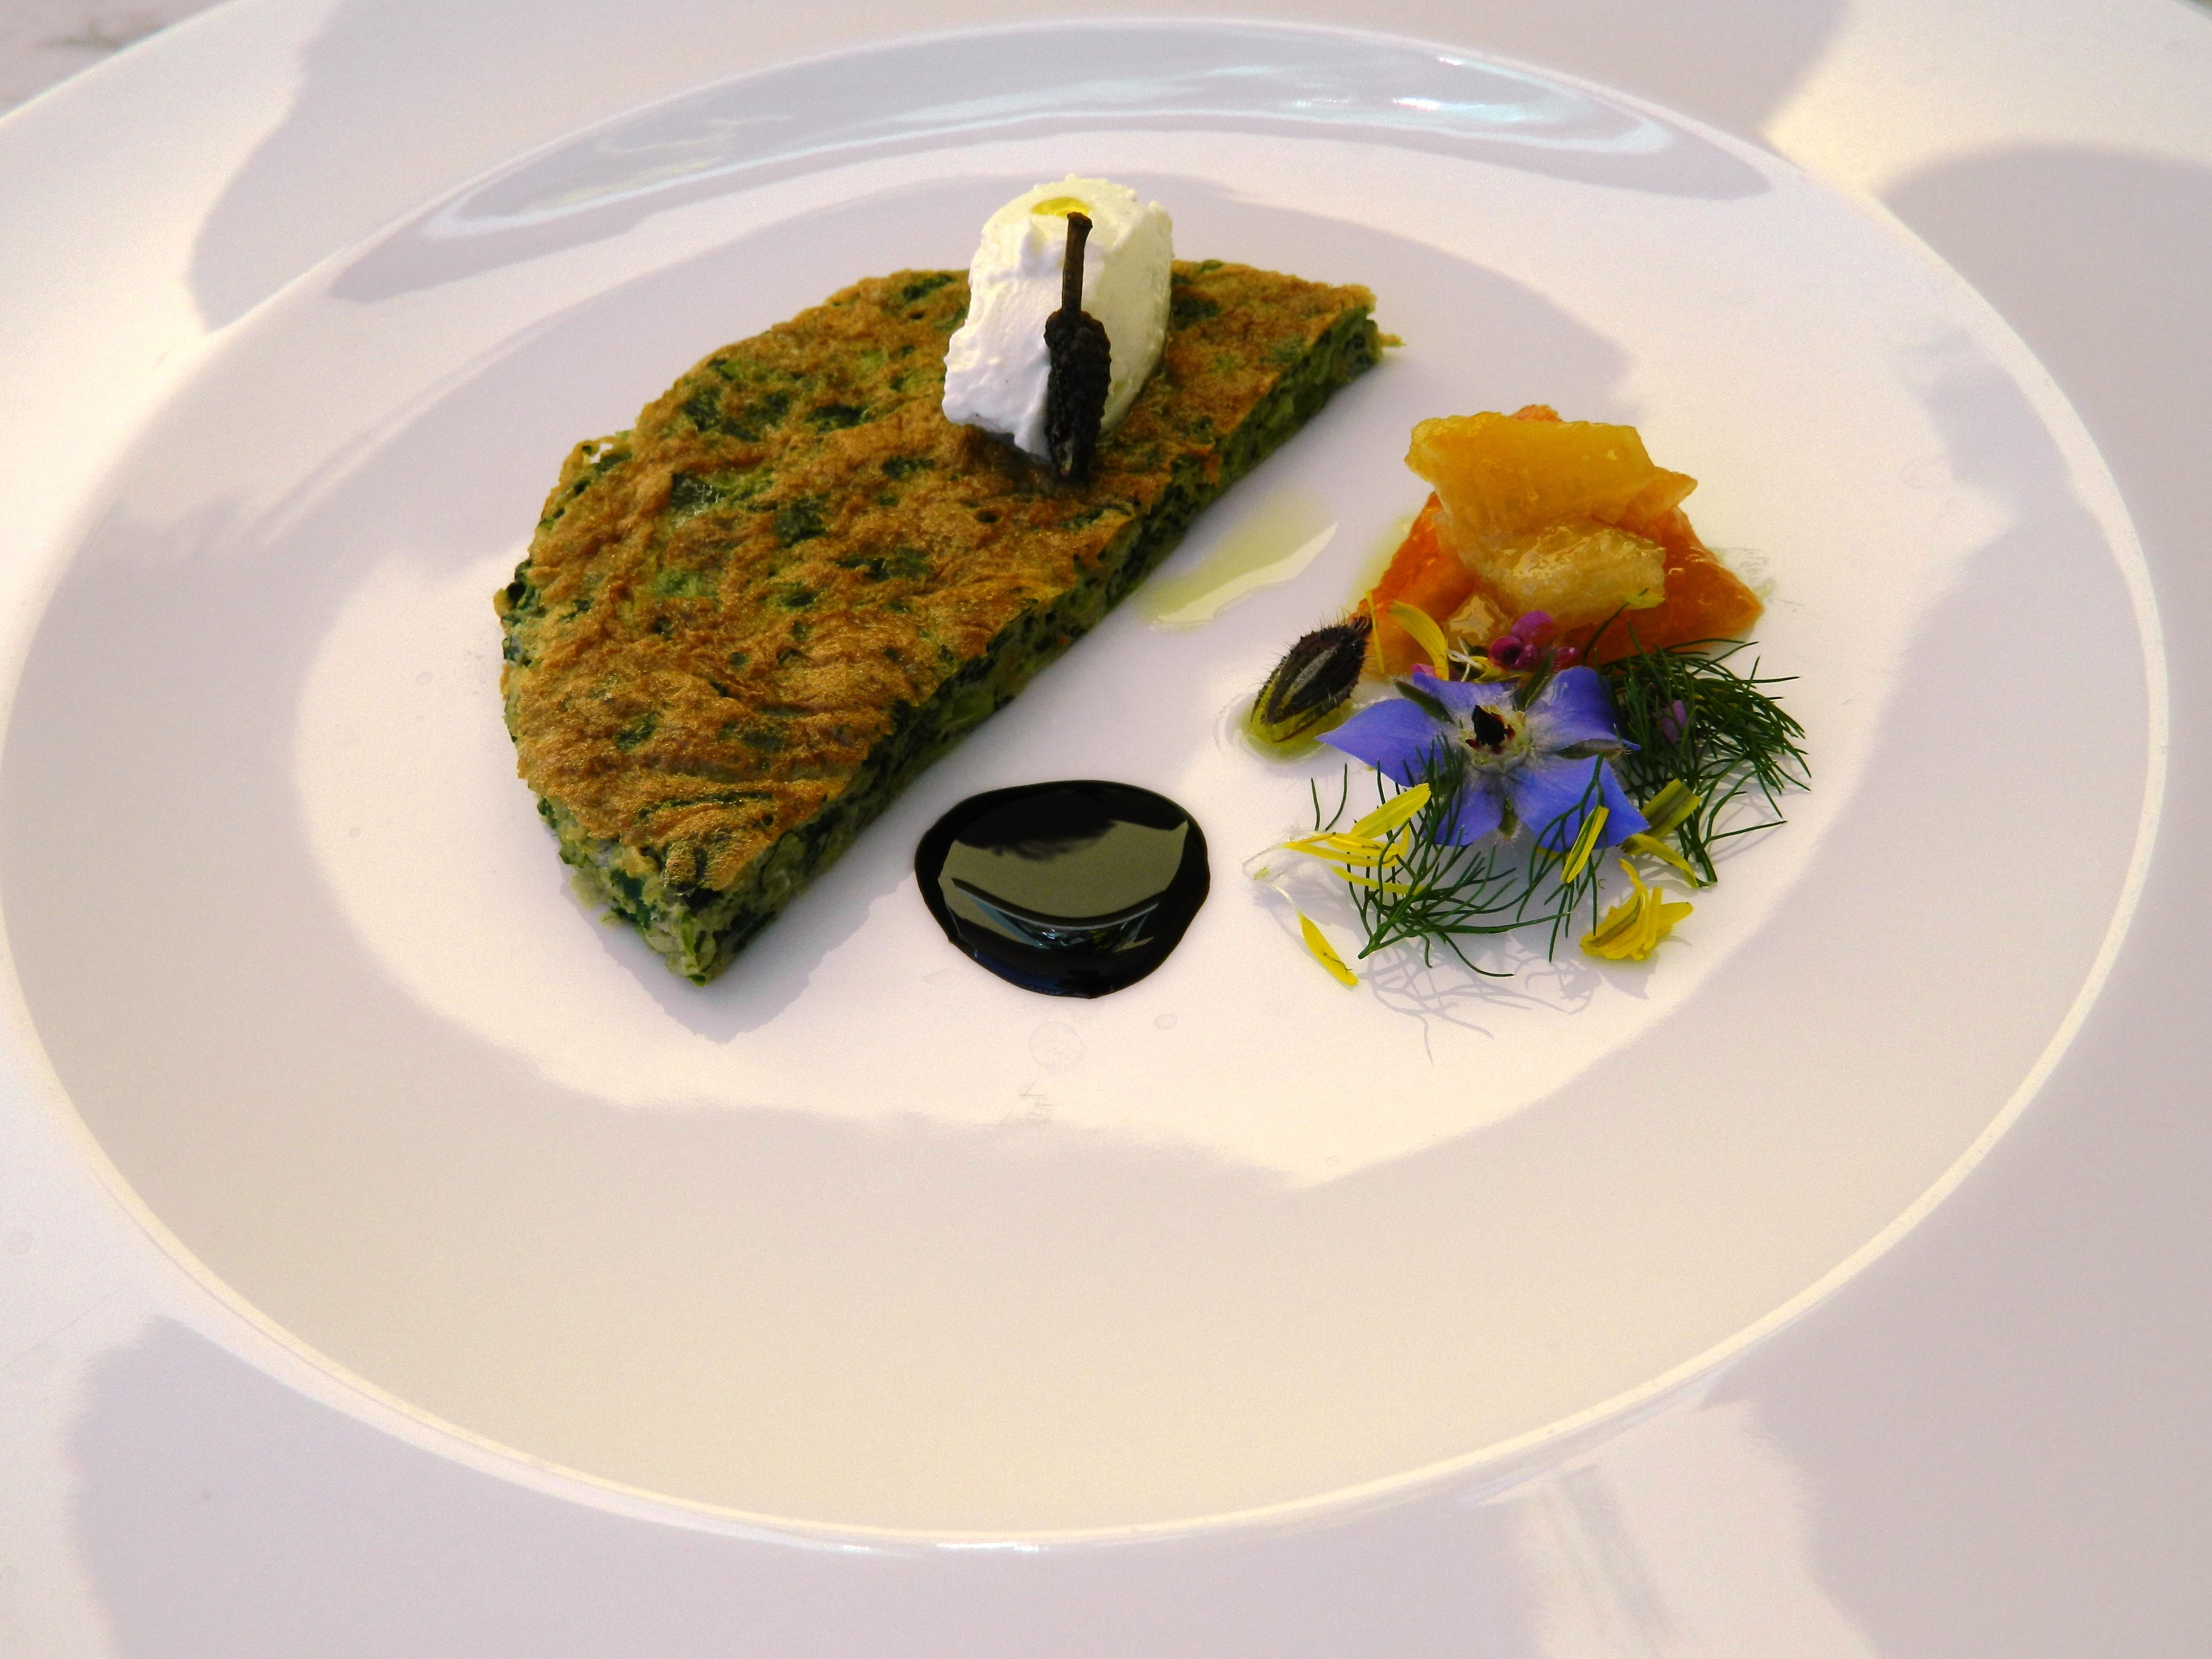 Amara frittata, mousse di ricotta e mostarda di agrumi